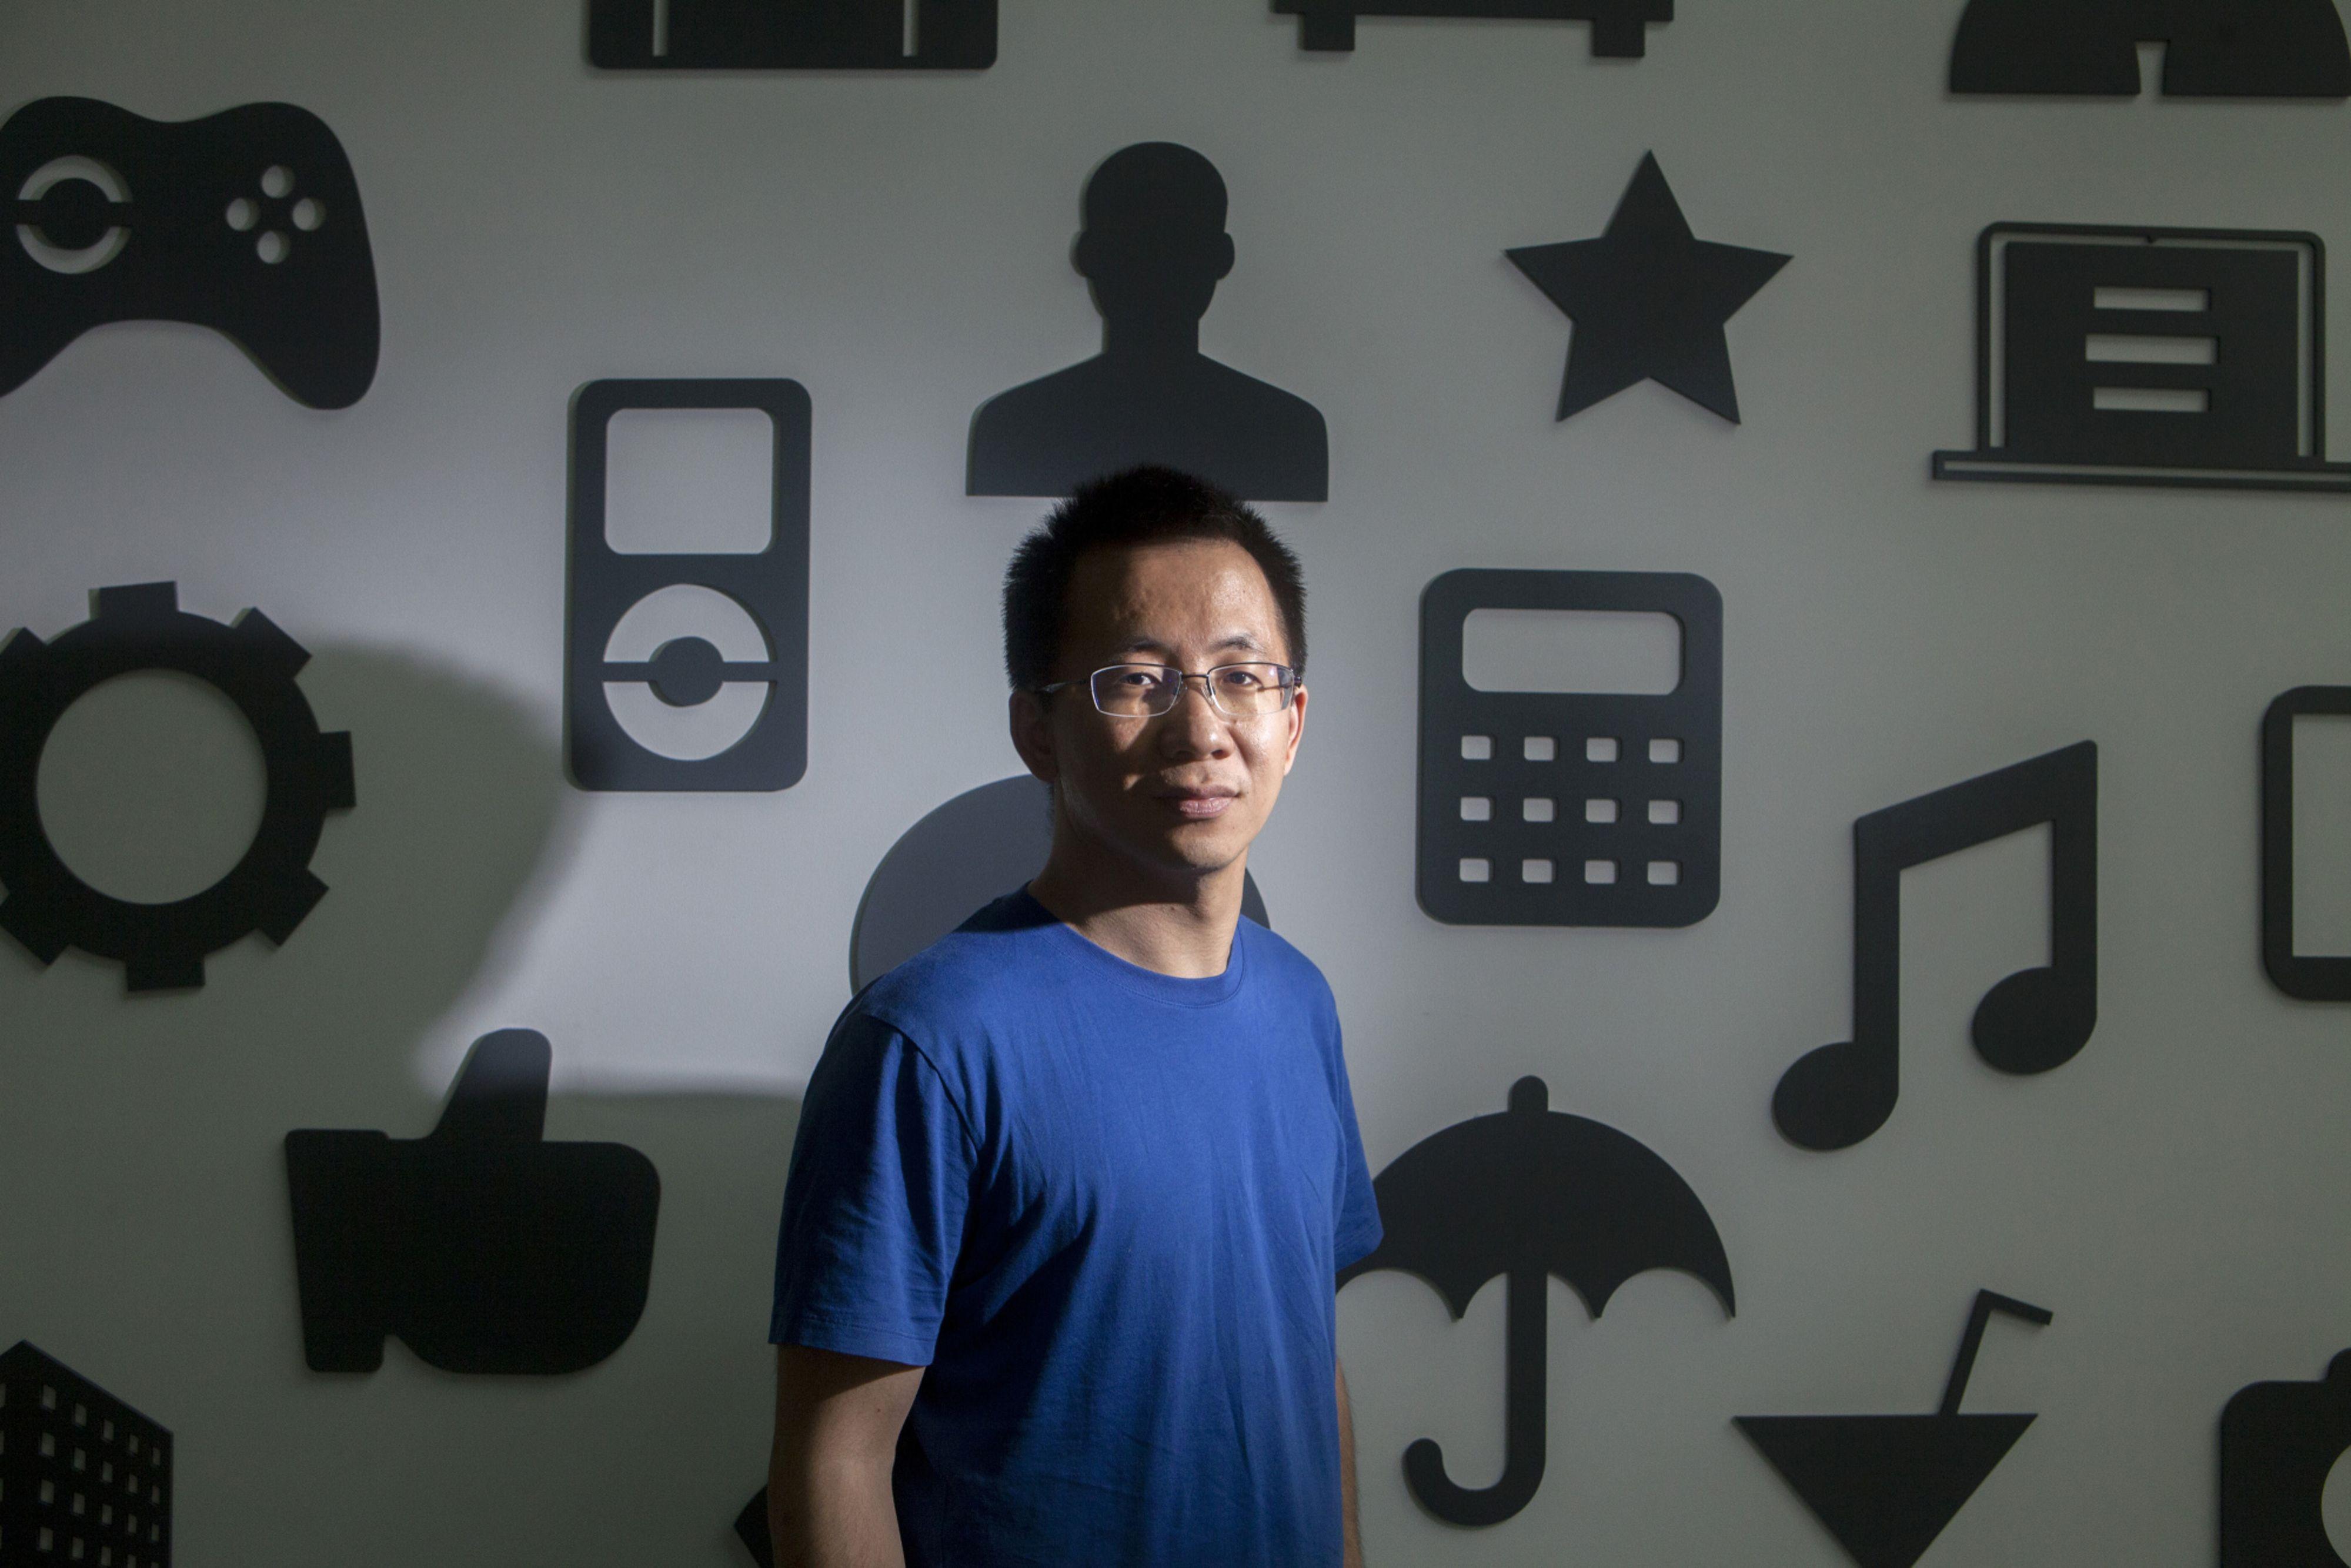 Beijing ByteDance Technology Co. Founder Zhang Yiming